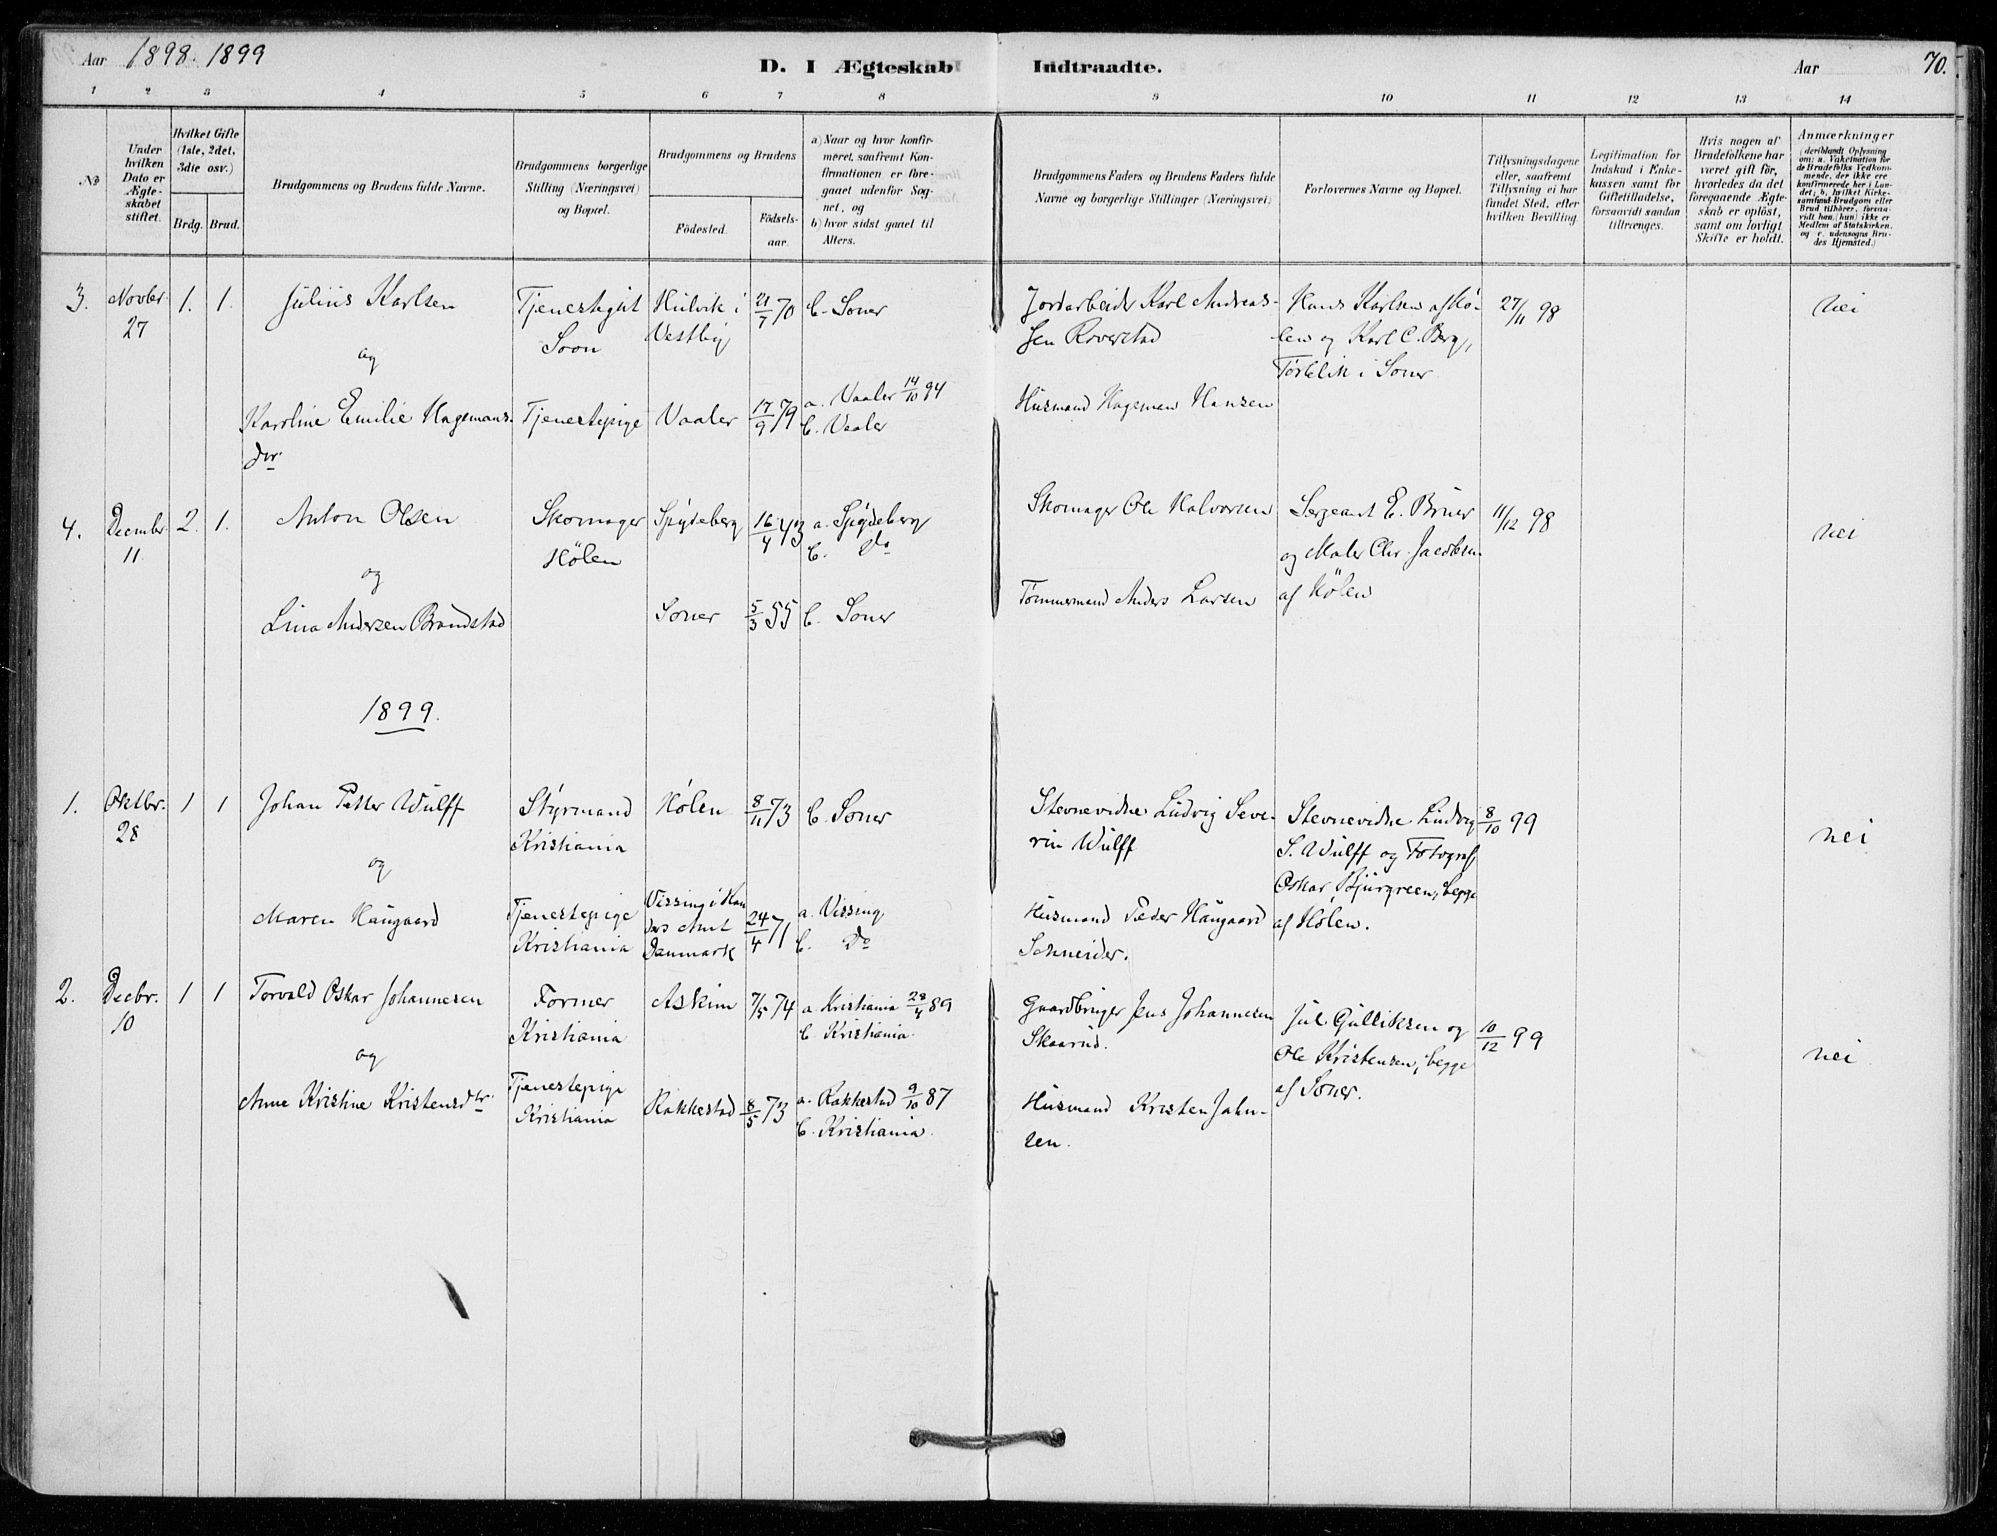 SAO, Vestby prestekontor Kirkebøker, F/Fe/L0001: Ministerialbok nr. V 1, 1878-1931, s. 70